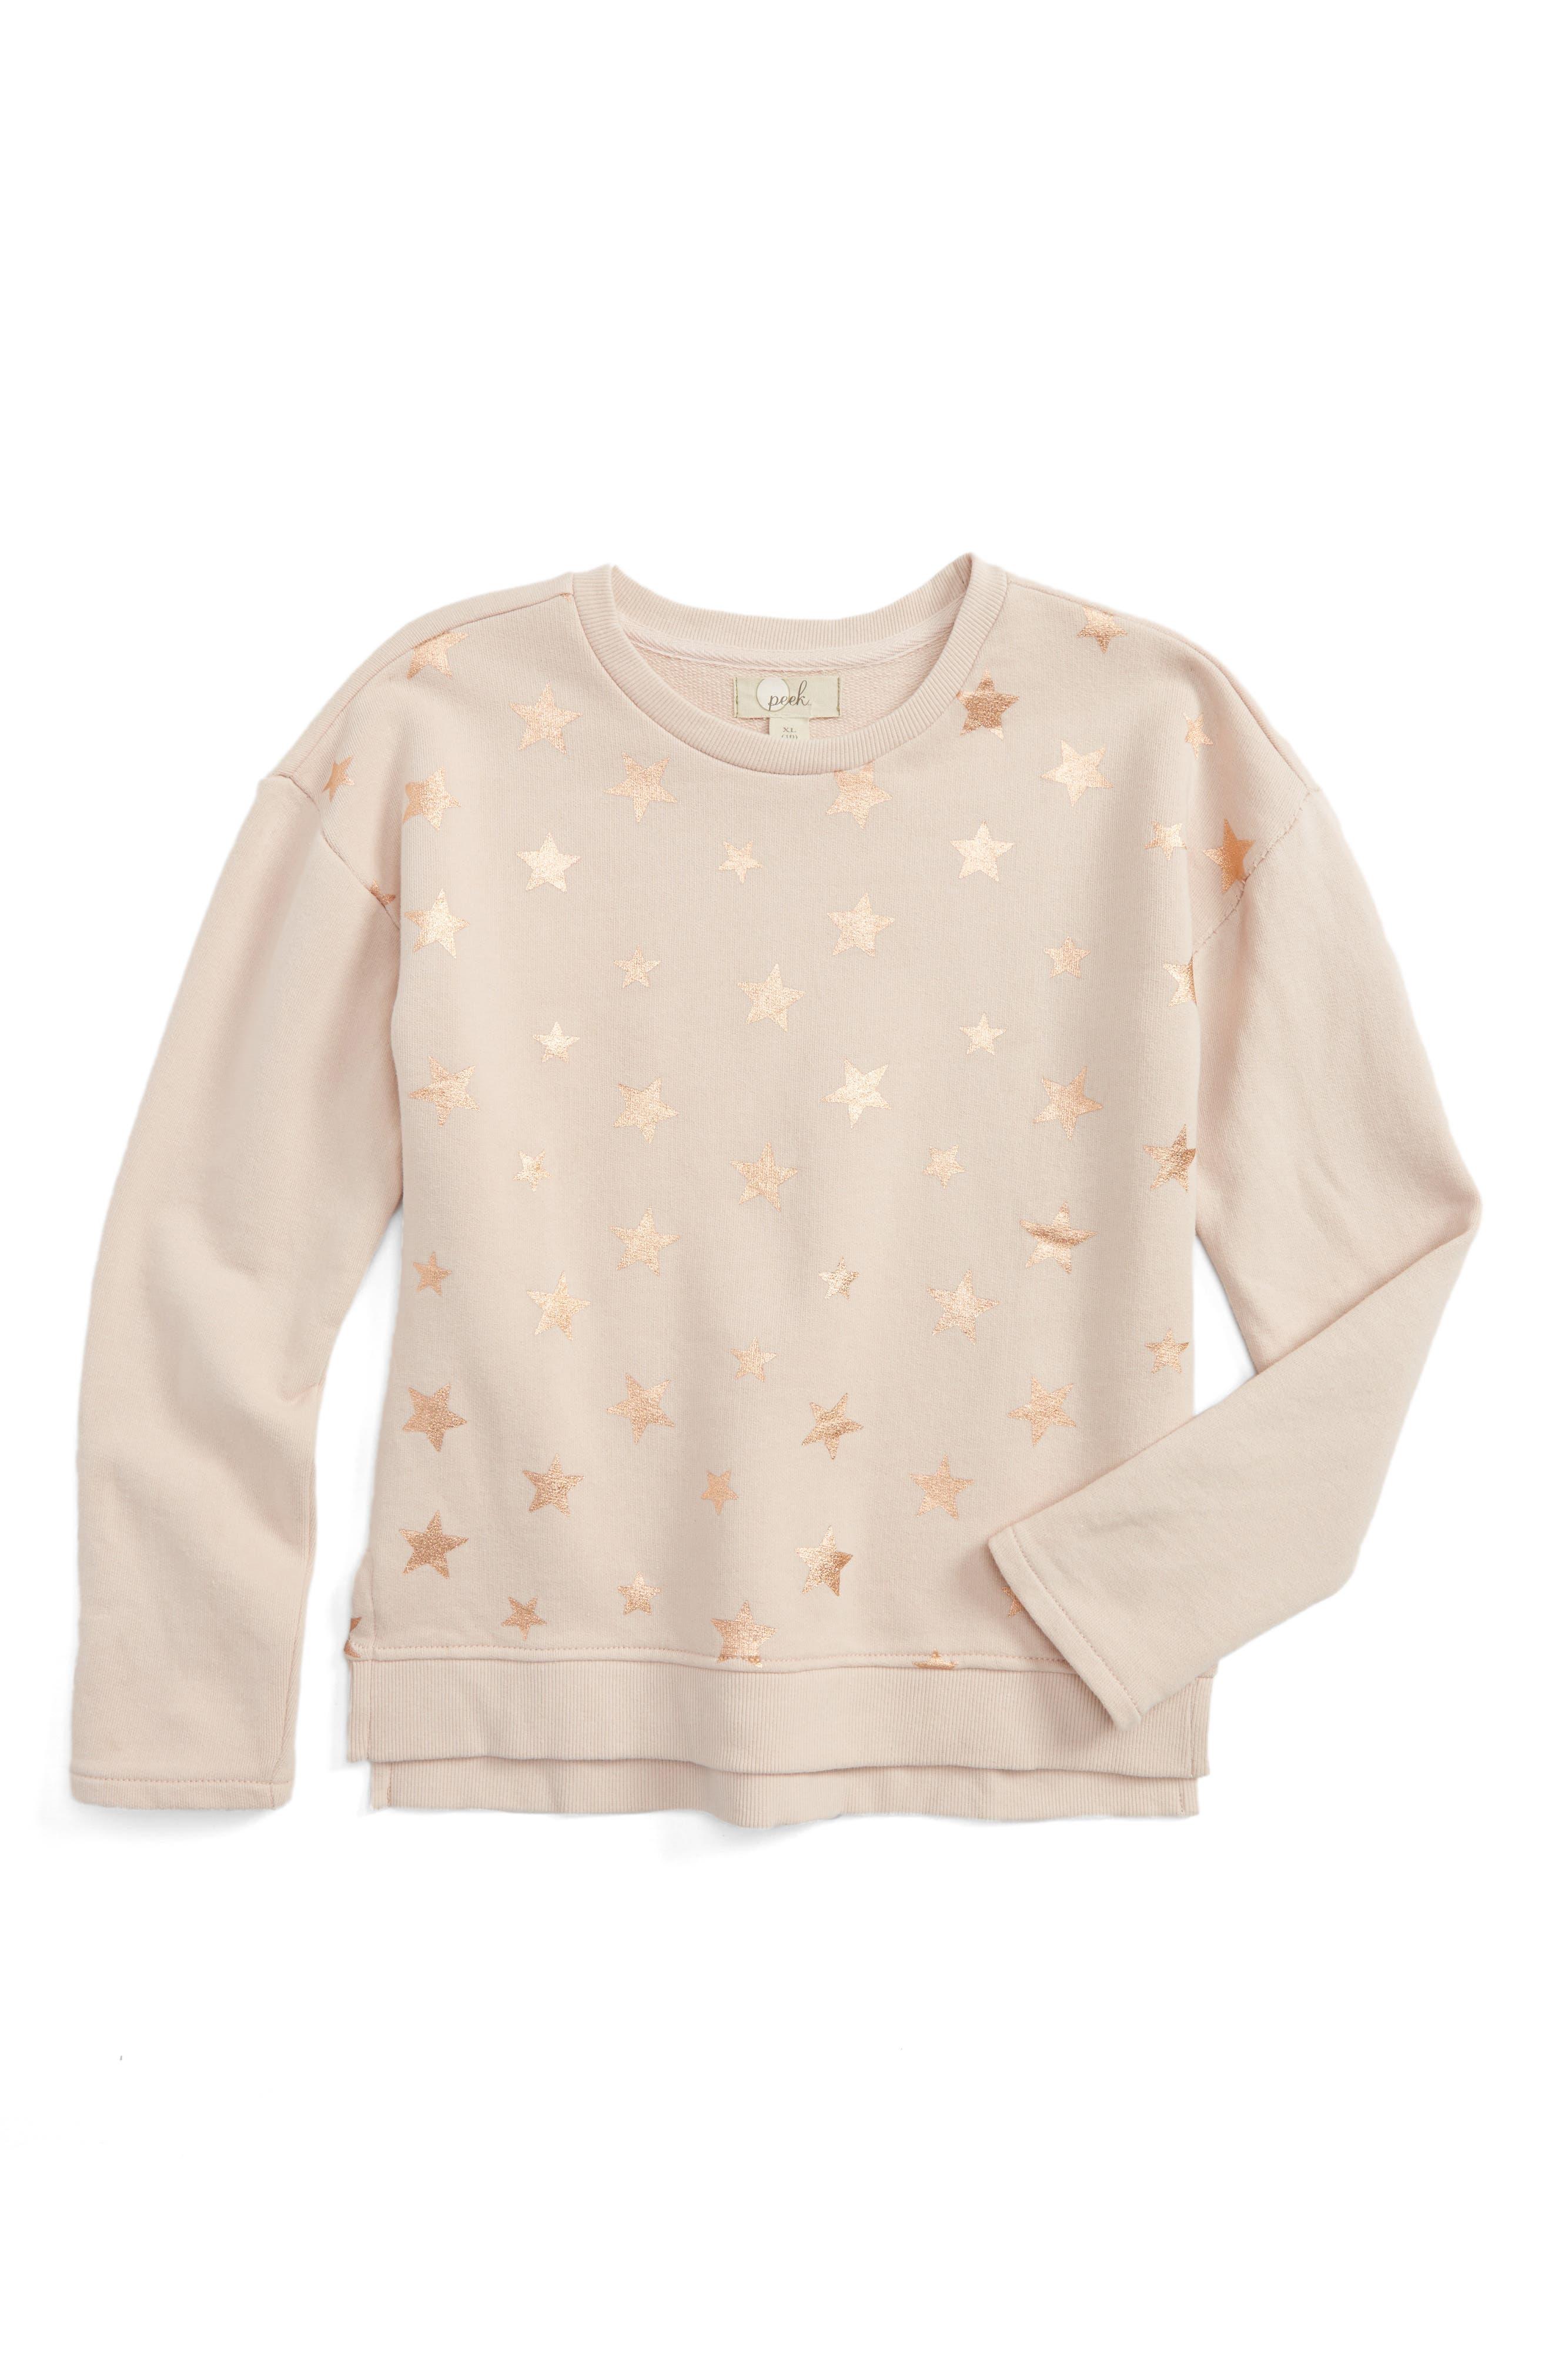 Peek Star Print Sweatshirt (Toddler Girls, Little Girls & Big Girls)